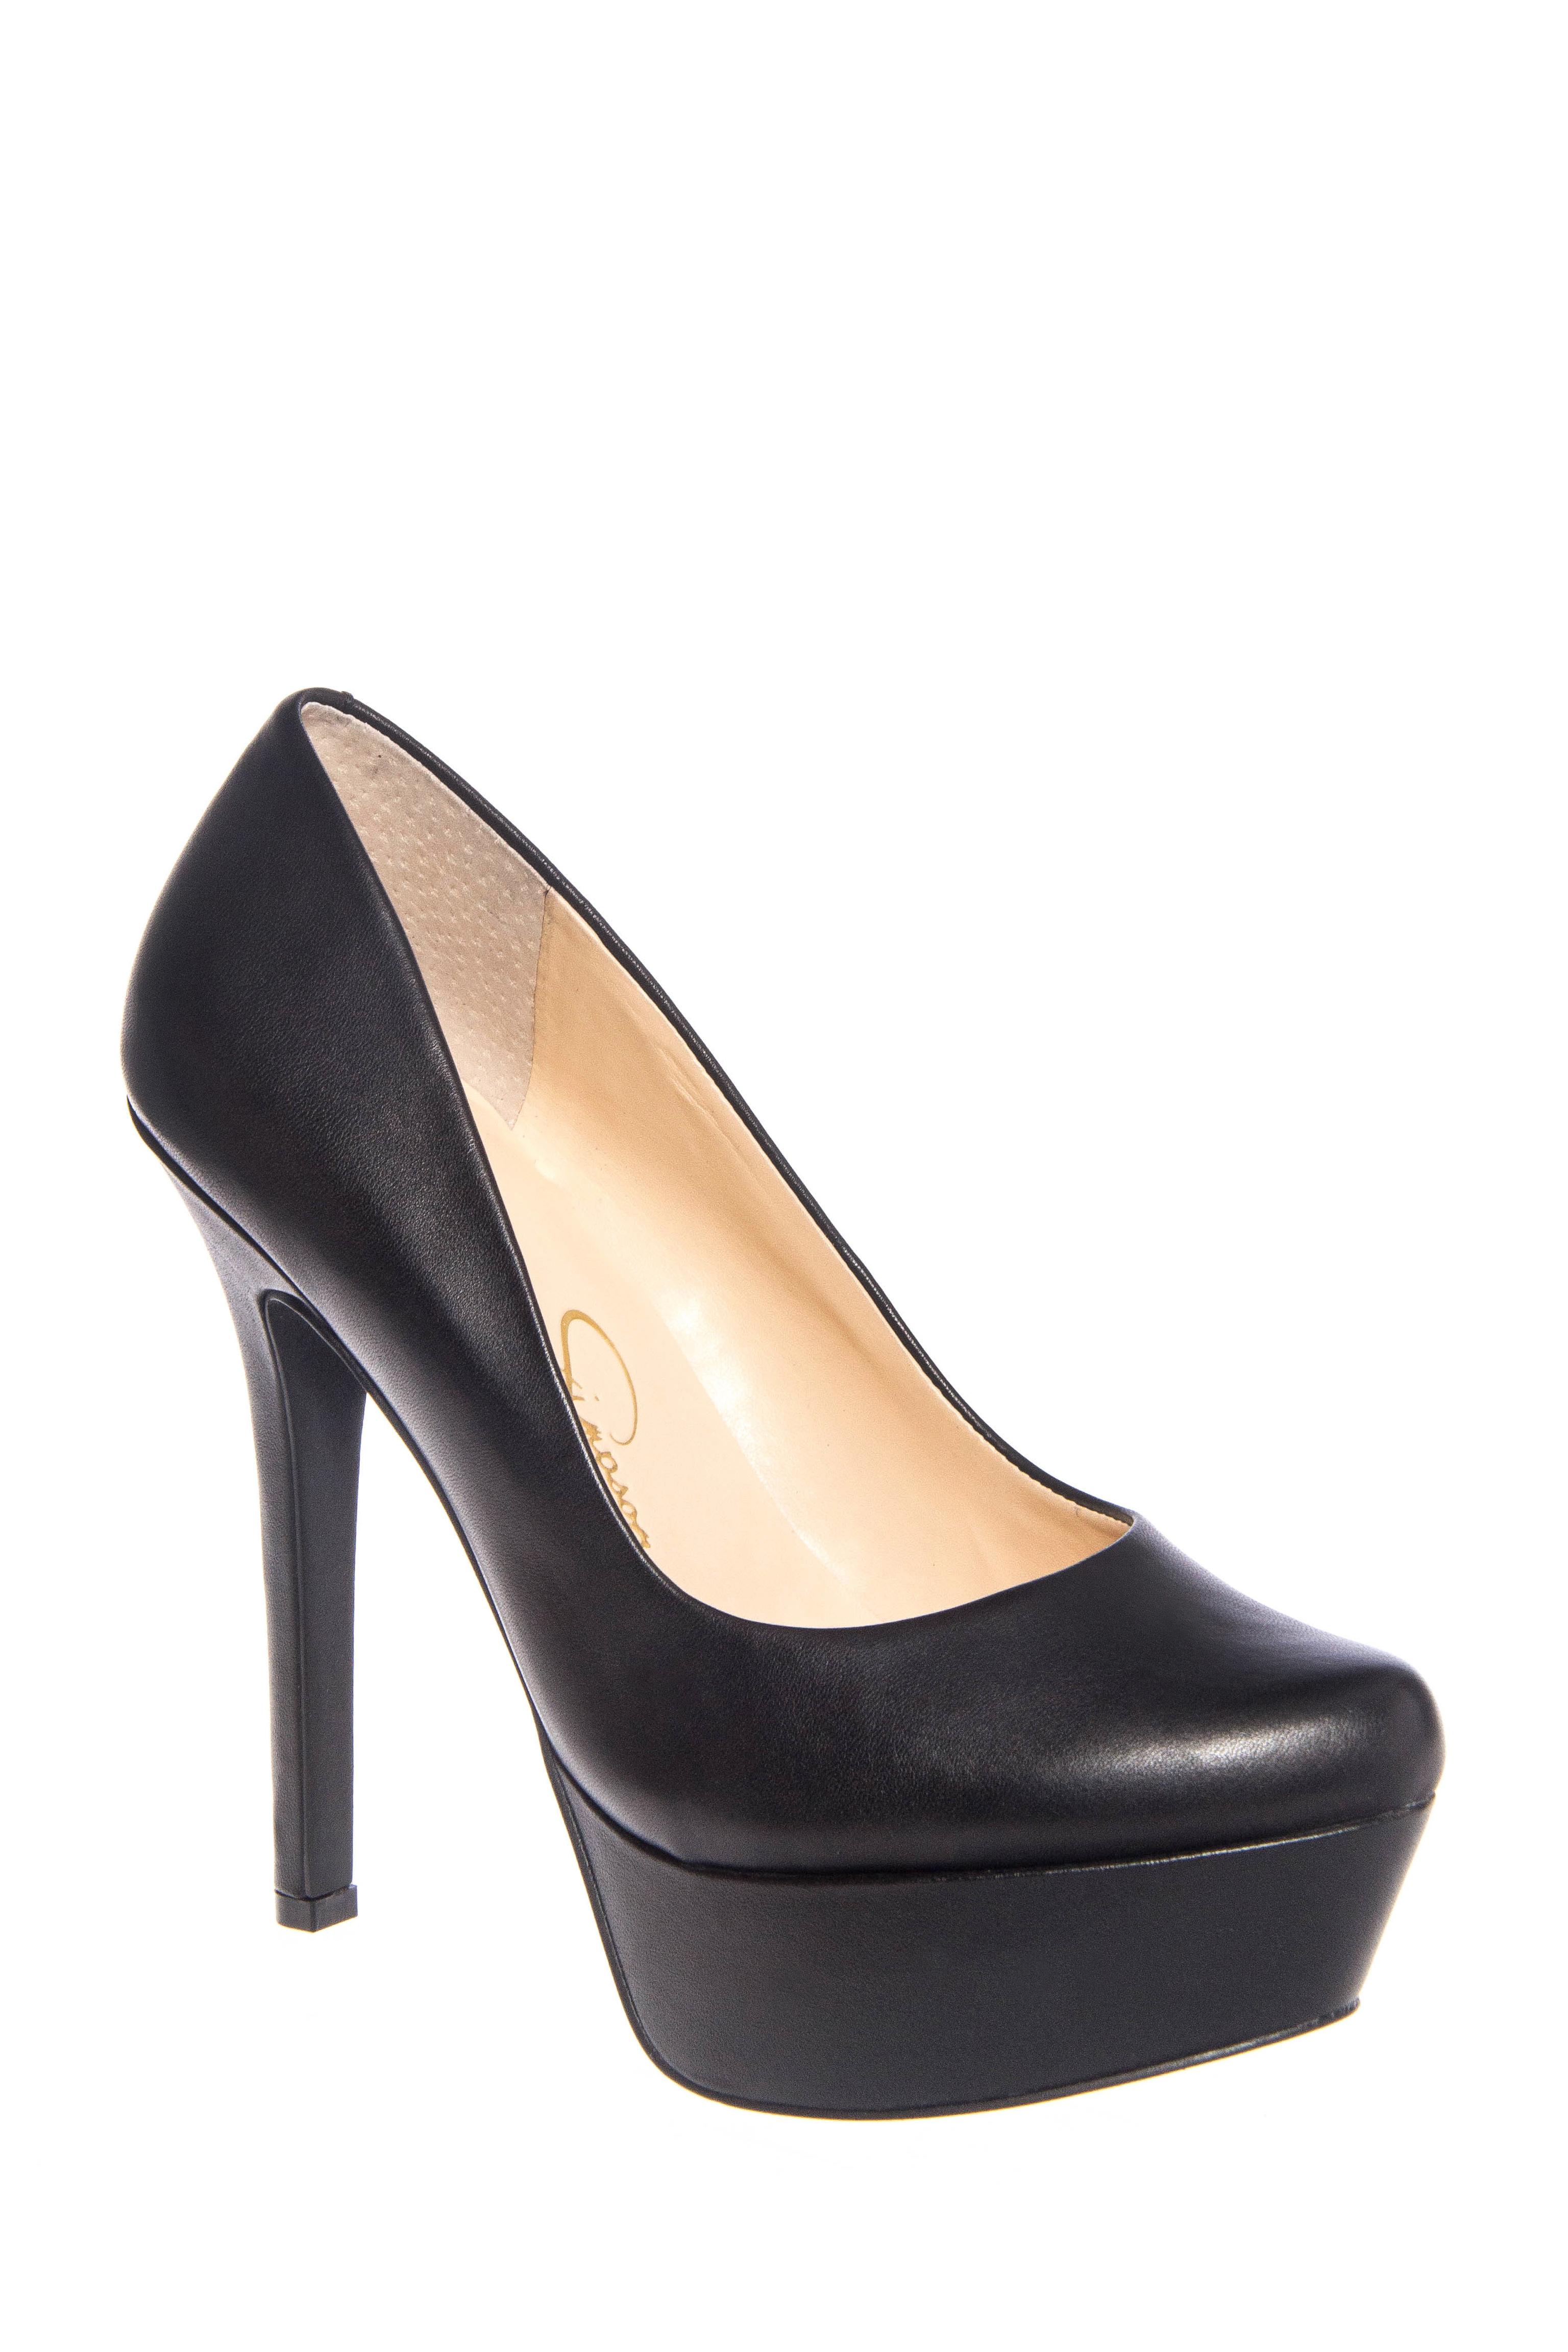 Jessica Simpson Waleo High Heel Platform Pumps - Black